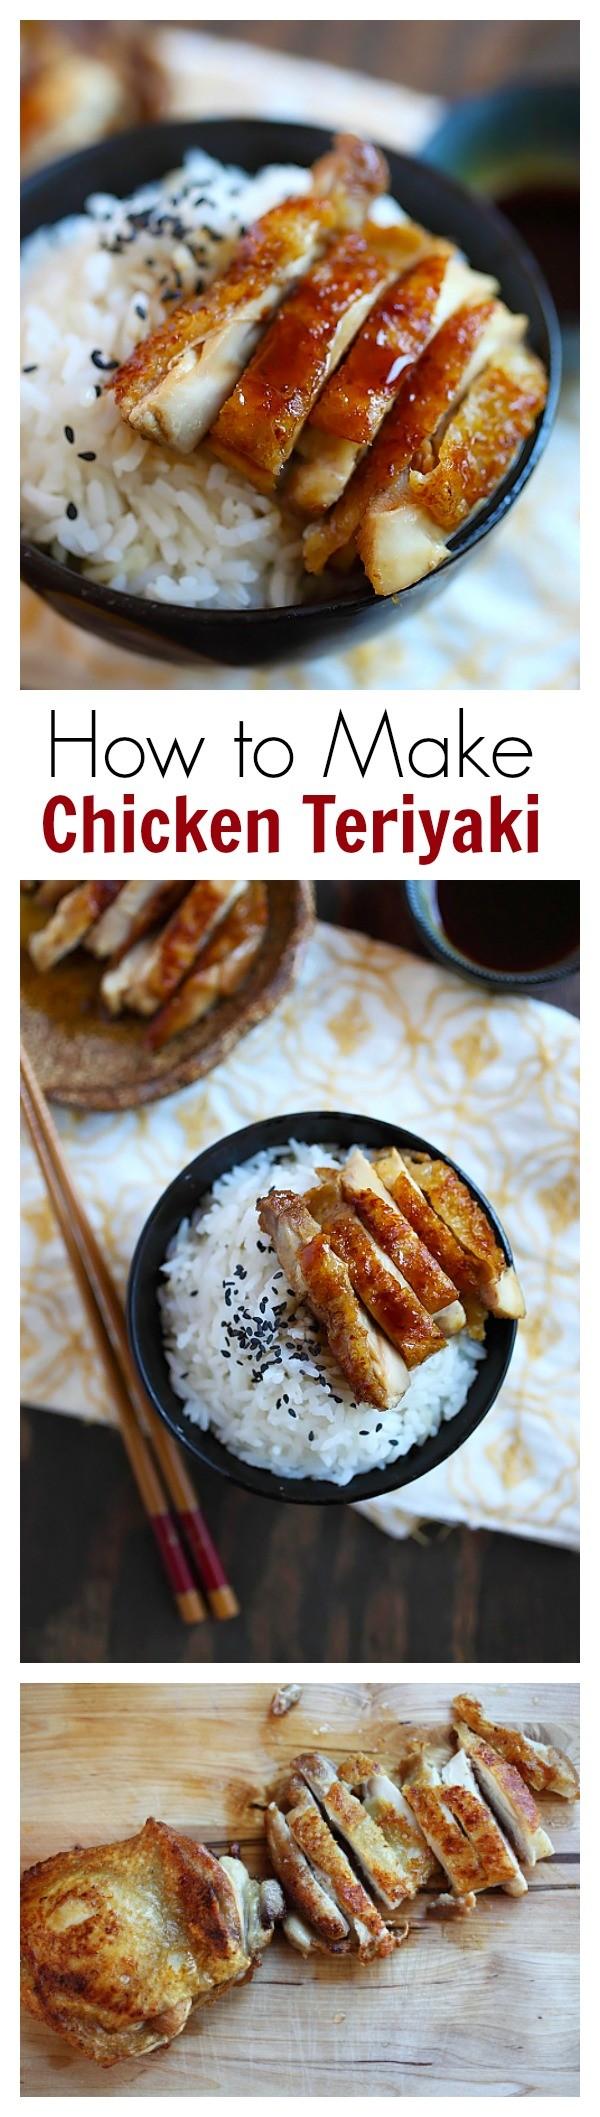 50 Best Chicken Recipes Ever - Get the recipe ♥ Chicken Teriyaki @recipes_to_go